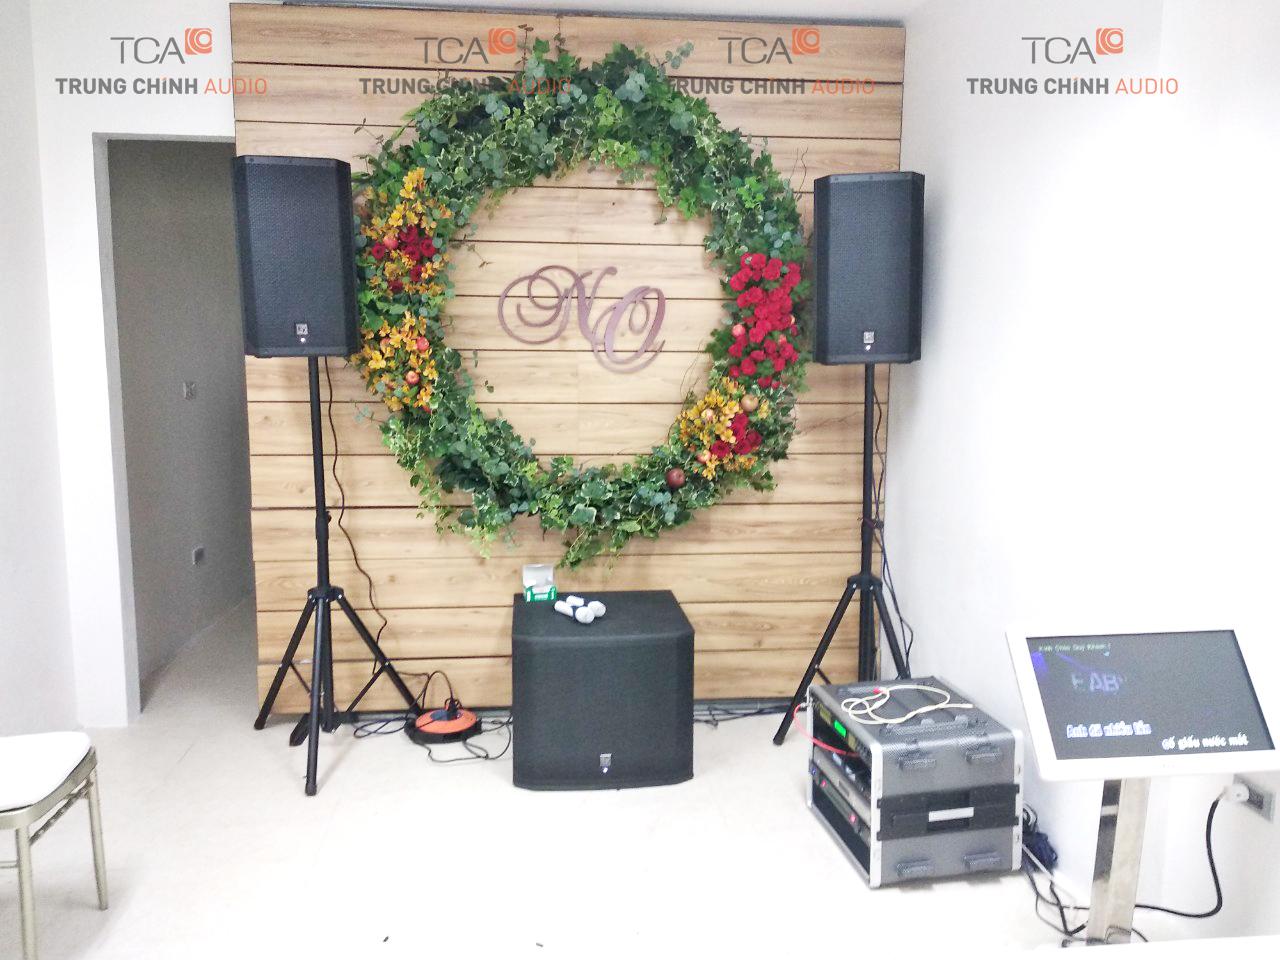 tca-lap-dat-karaoke-ev-ha-noi